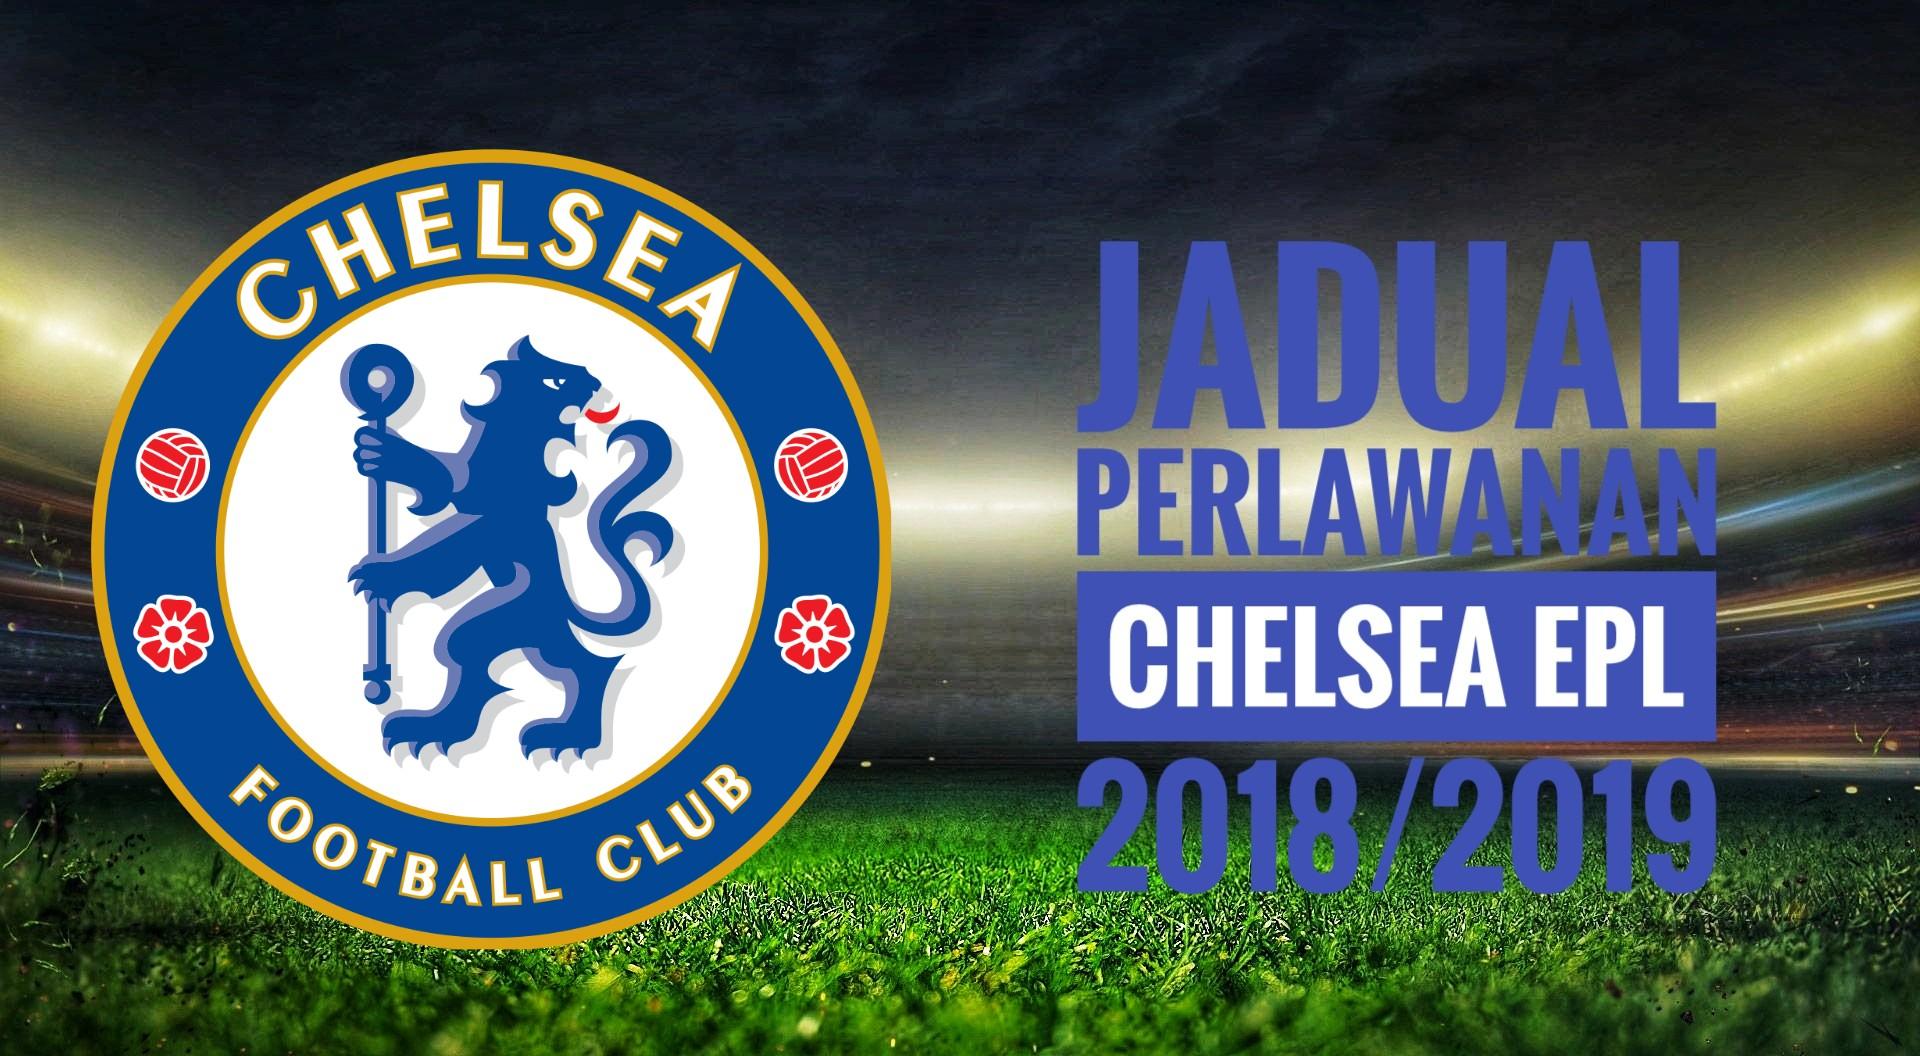 Jadual Perlawanan Chelsea EPL 2018/2019